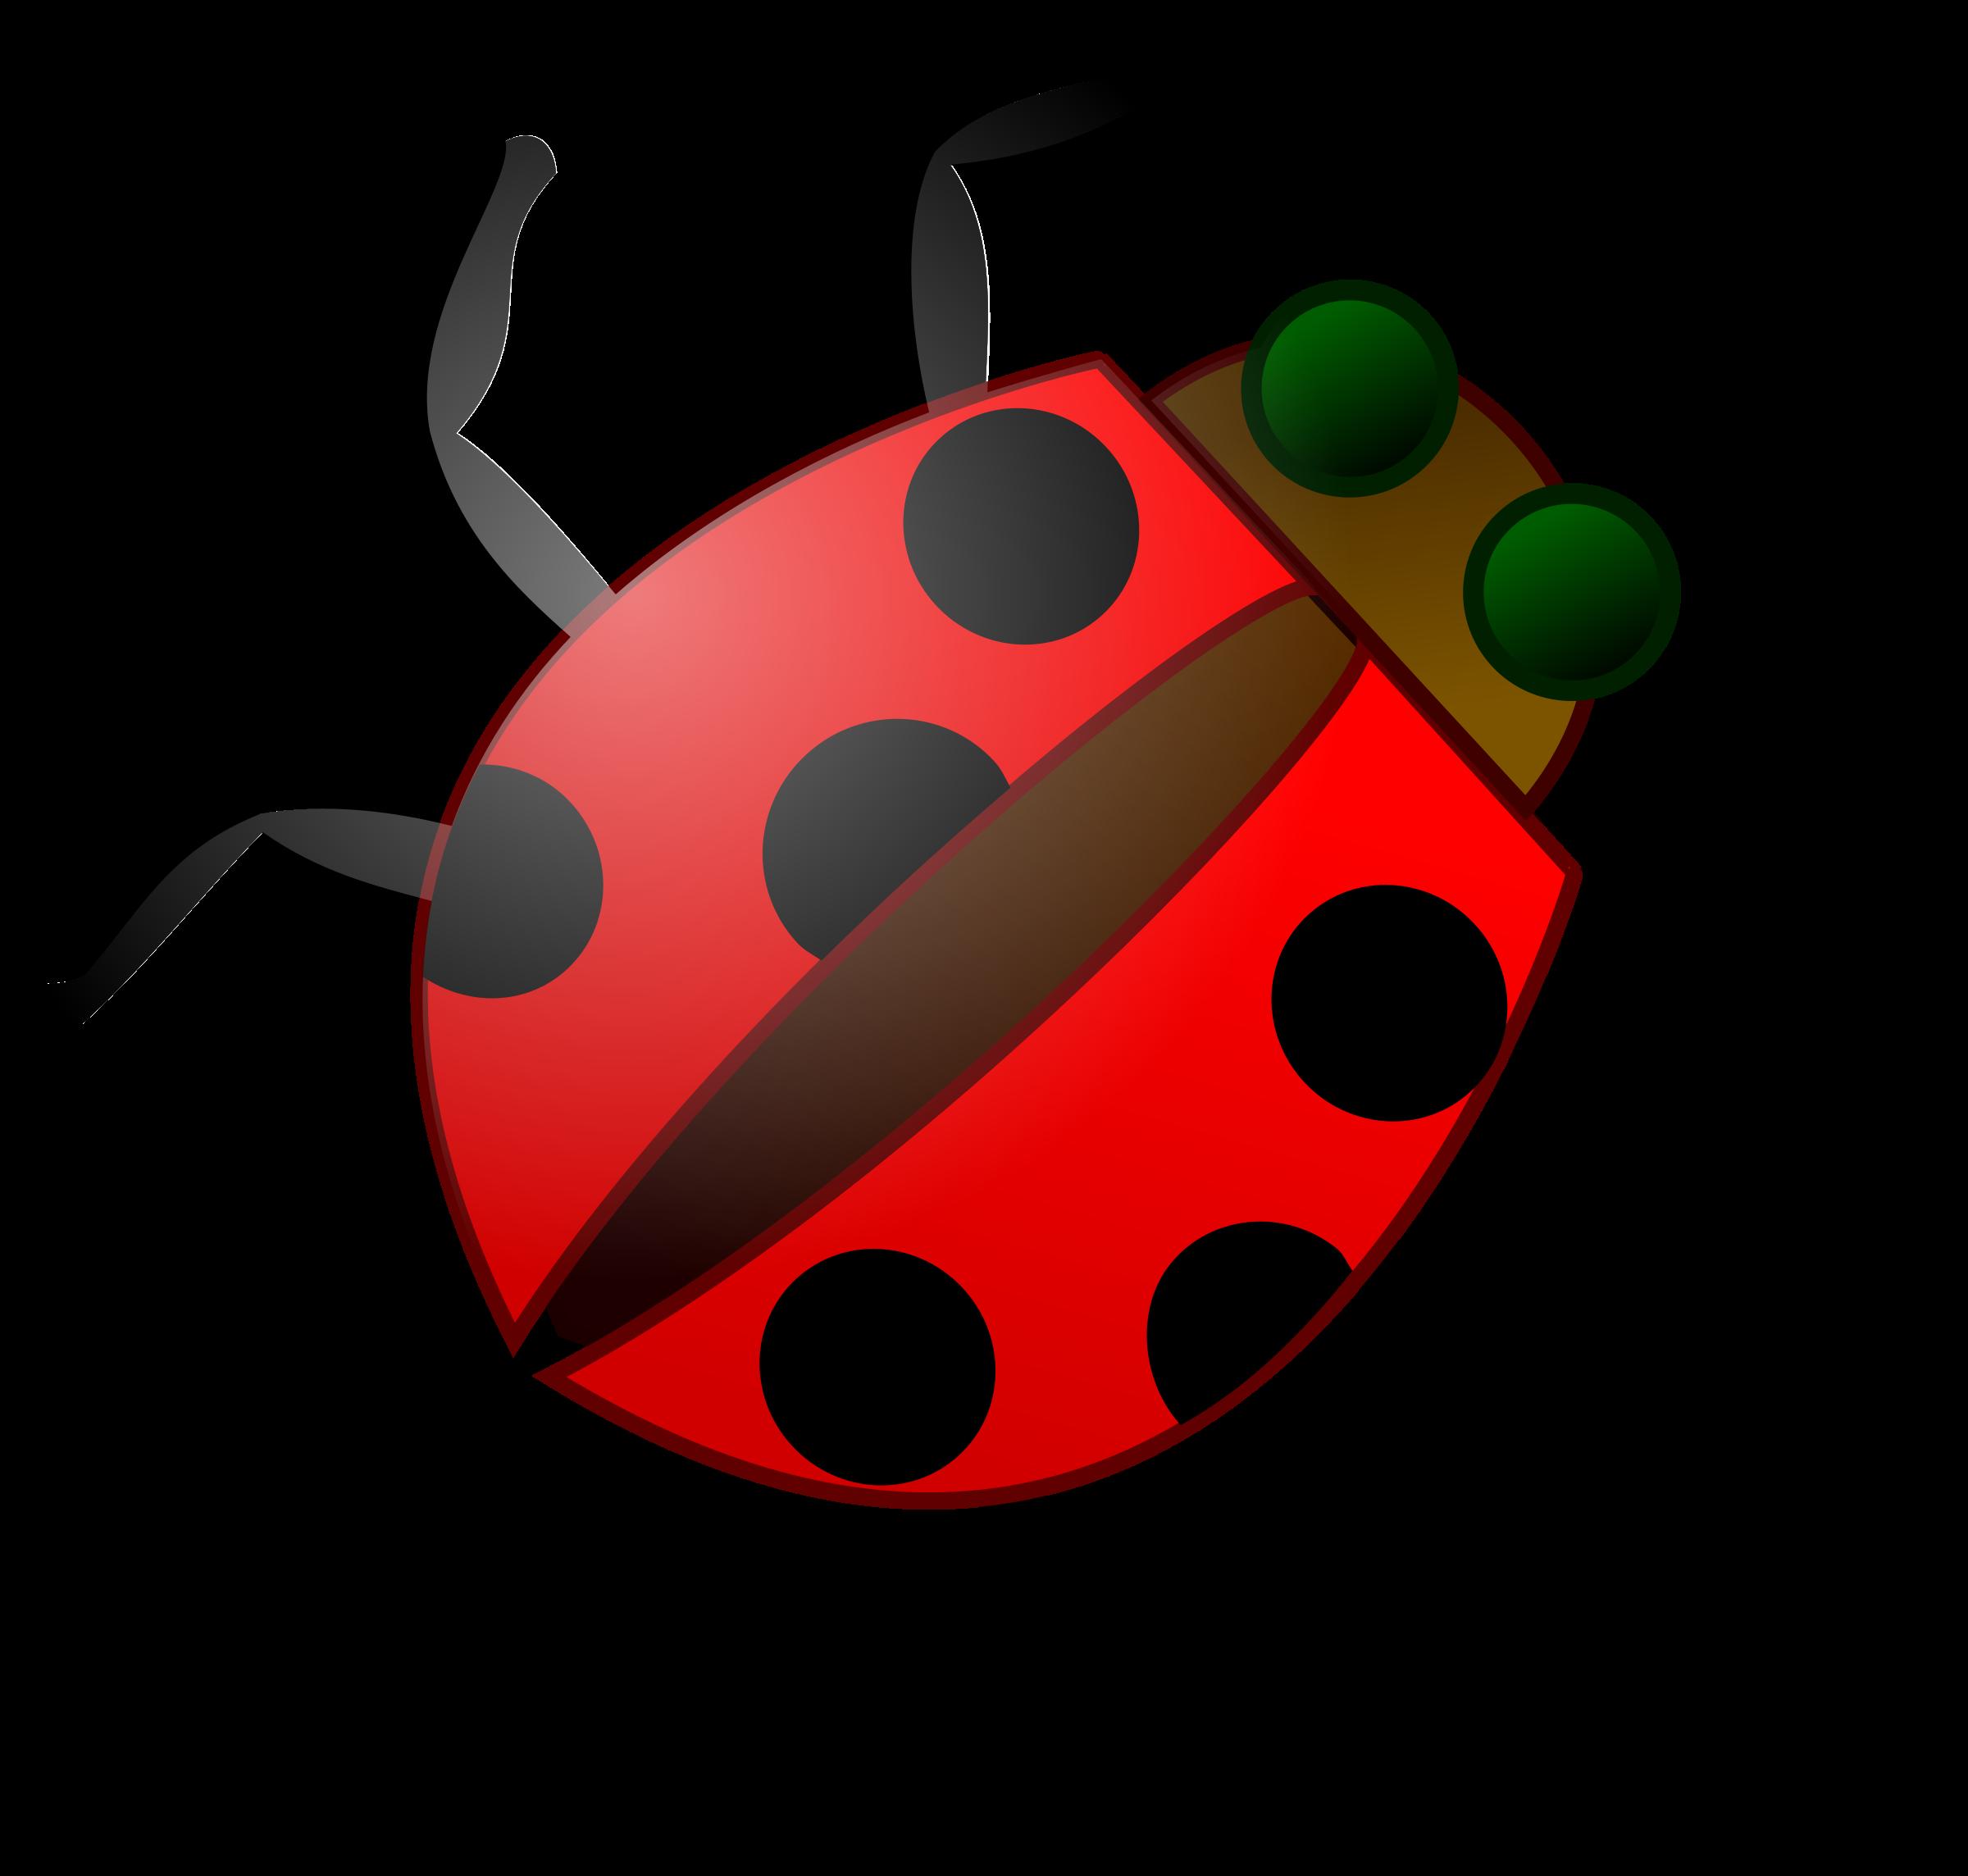 Ladybug big image png. Ladybugs clipart leaf clip art